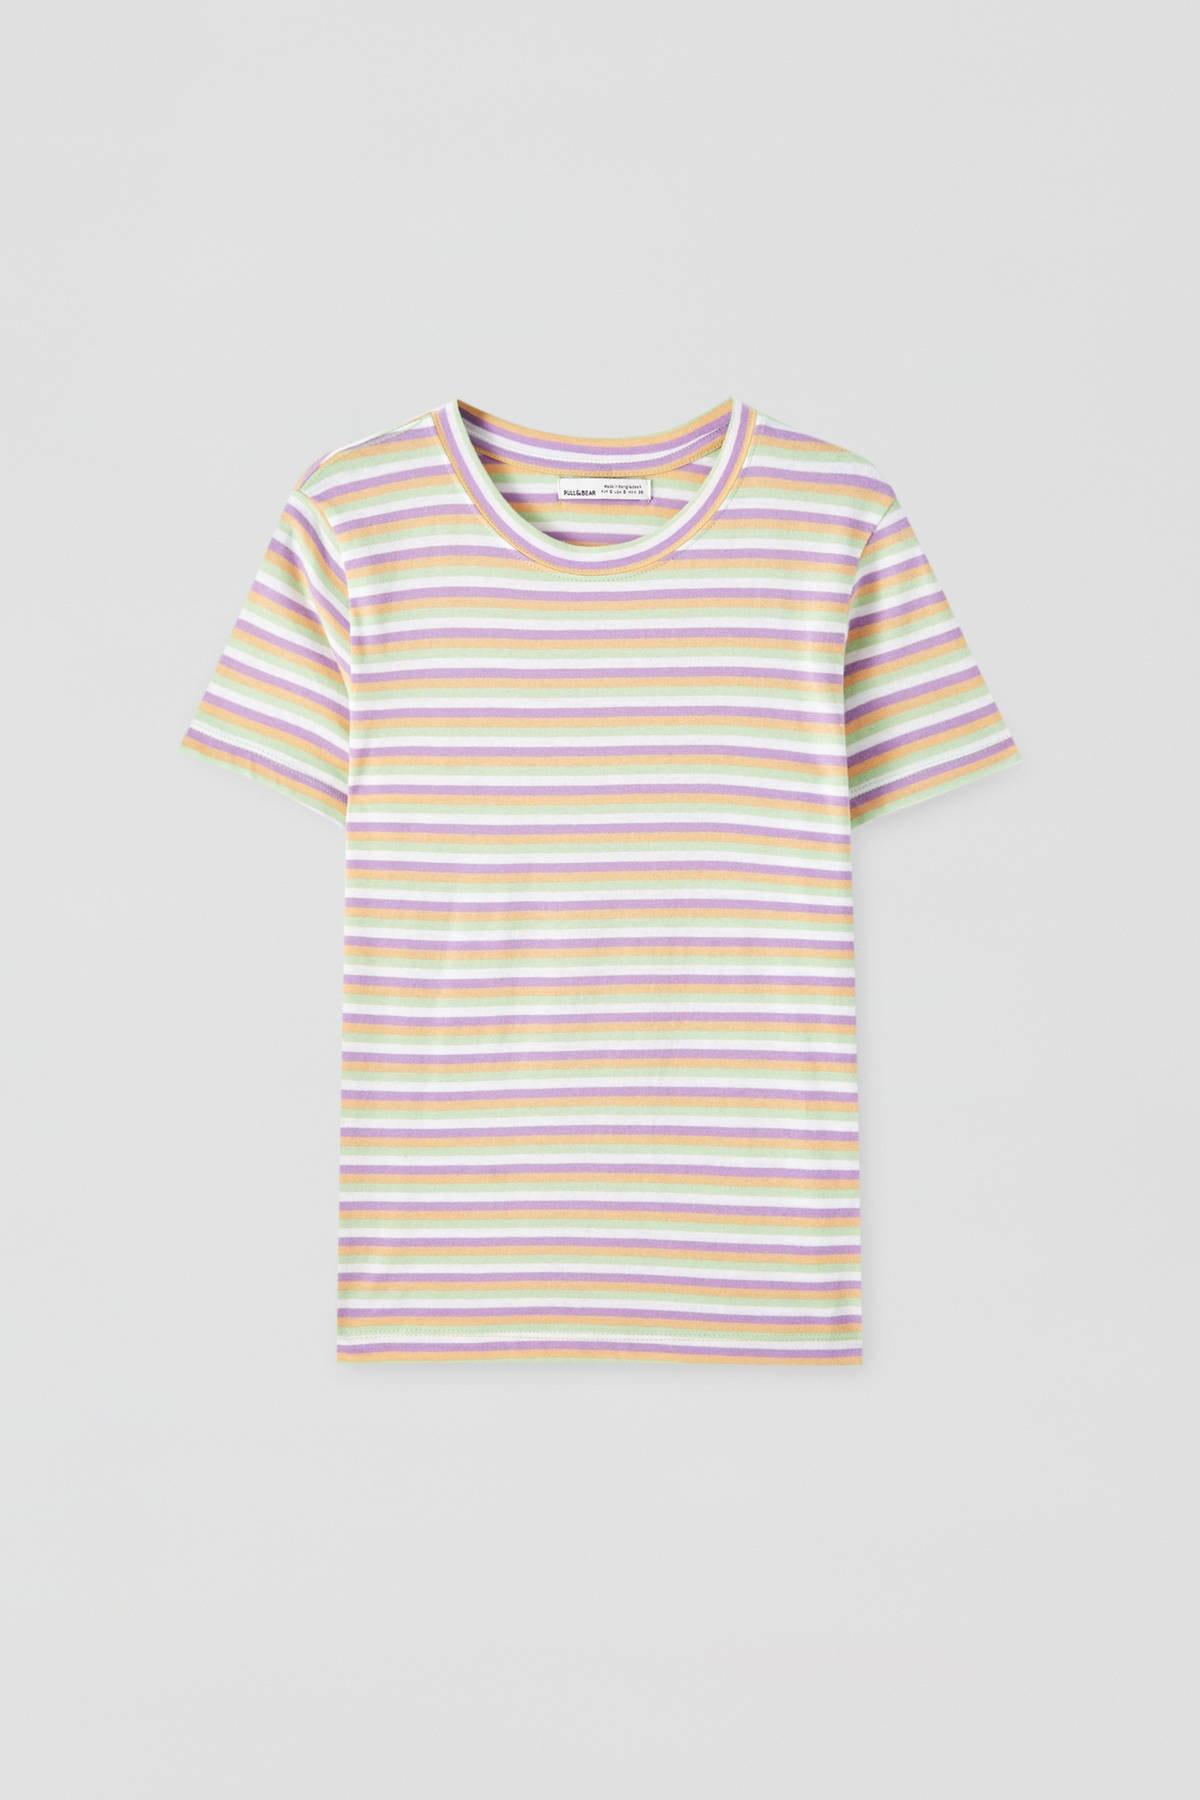 Pull & Bear Kadın Violet Yatay Çizgili Basic T-Shirt 05236353